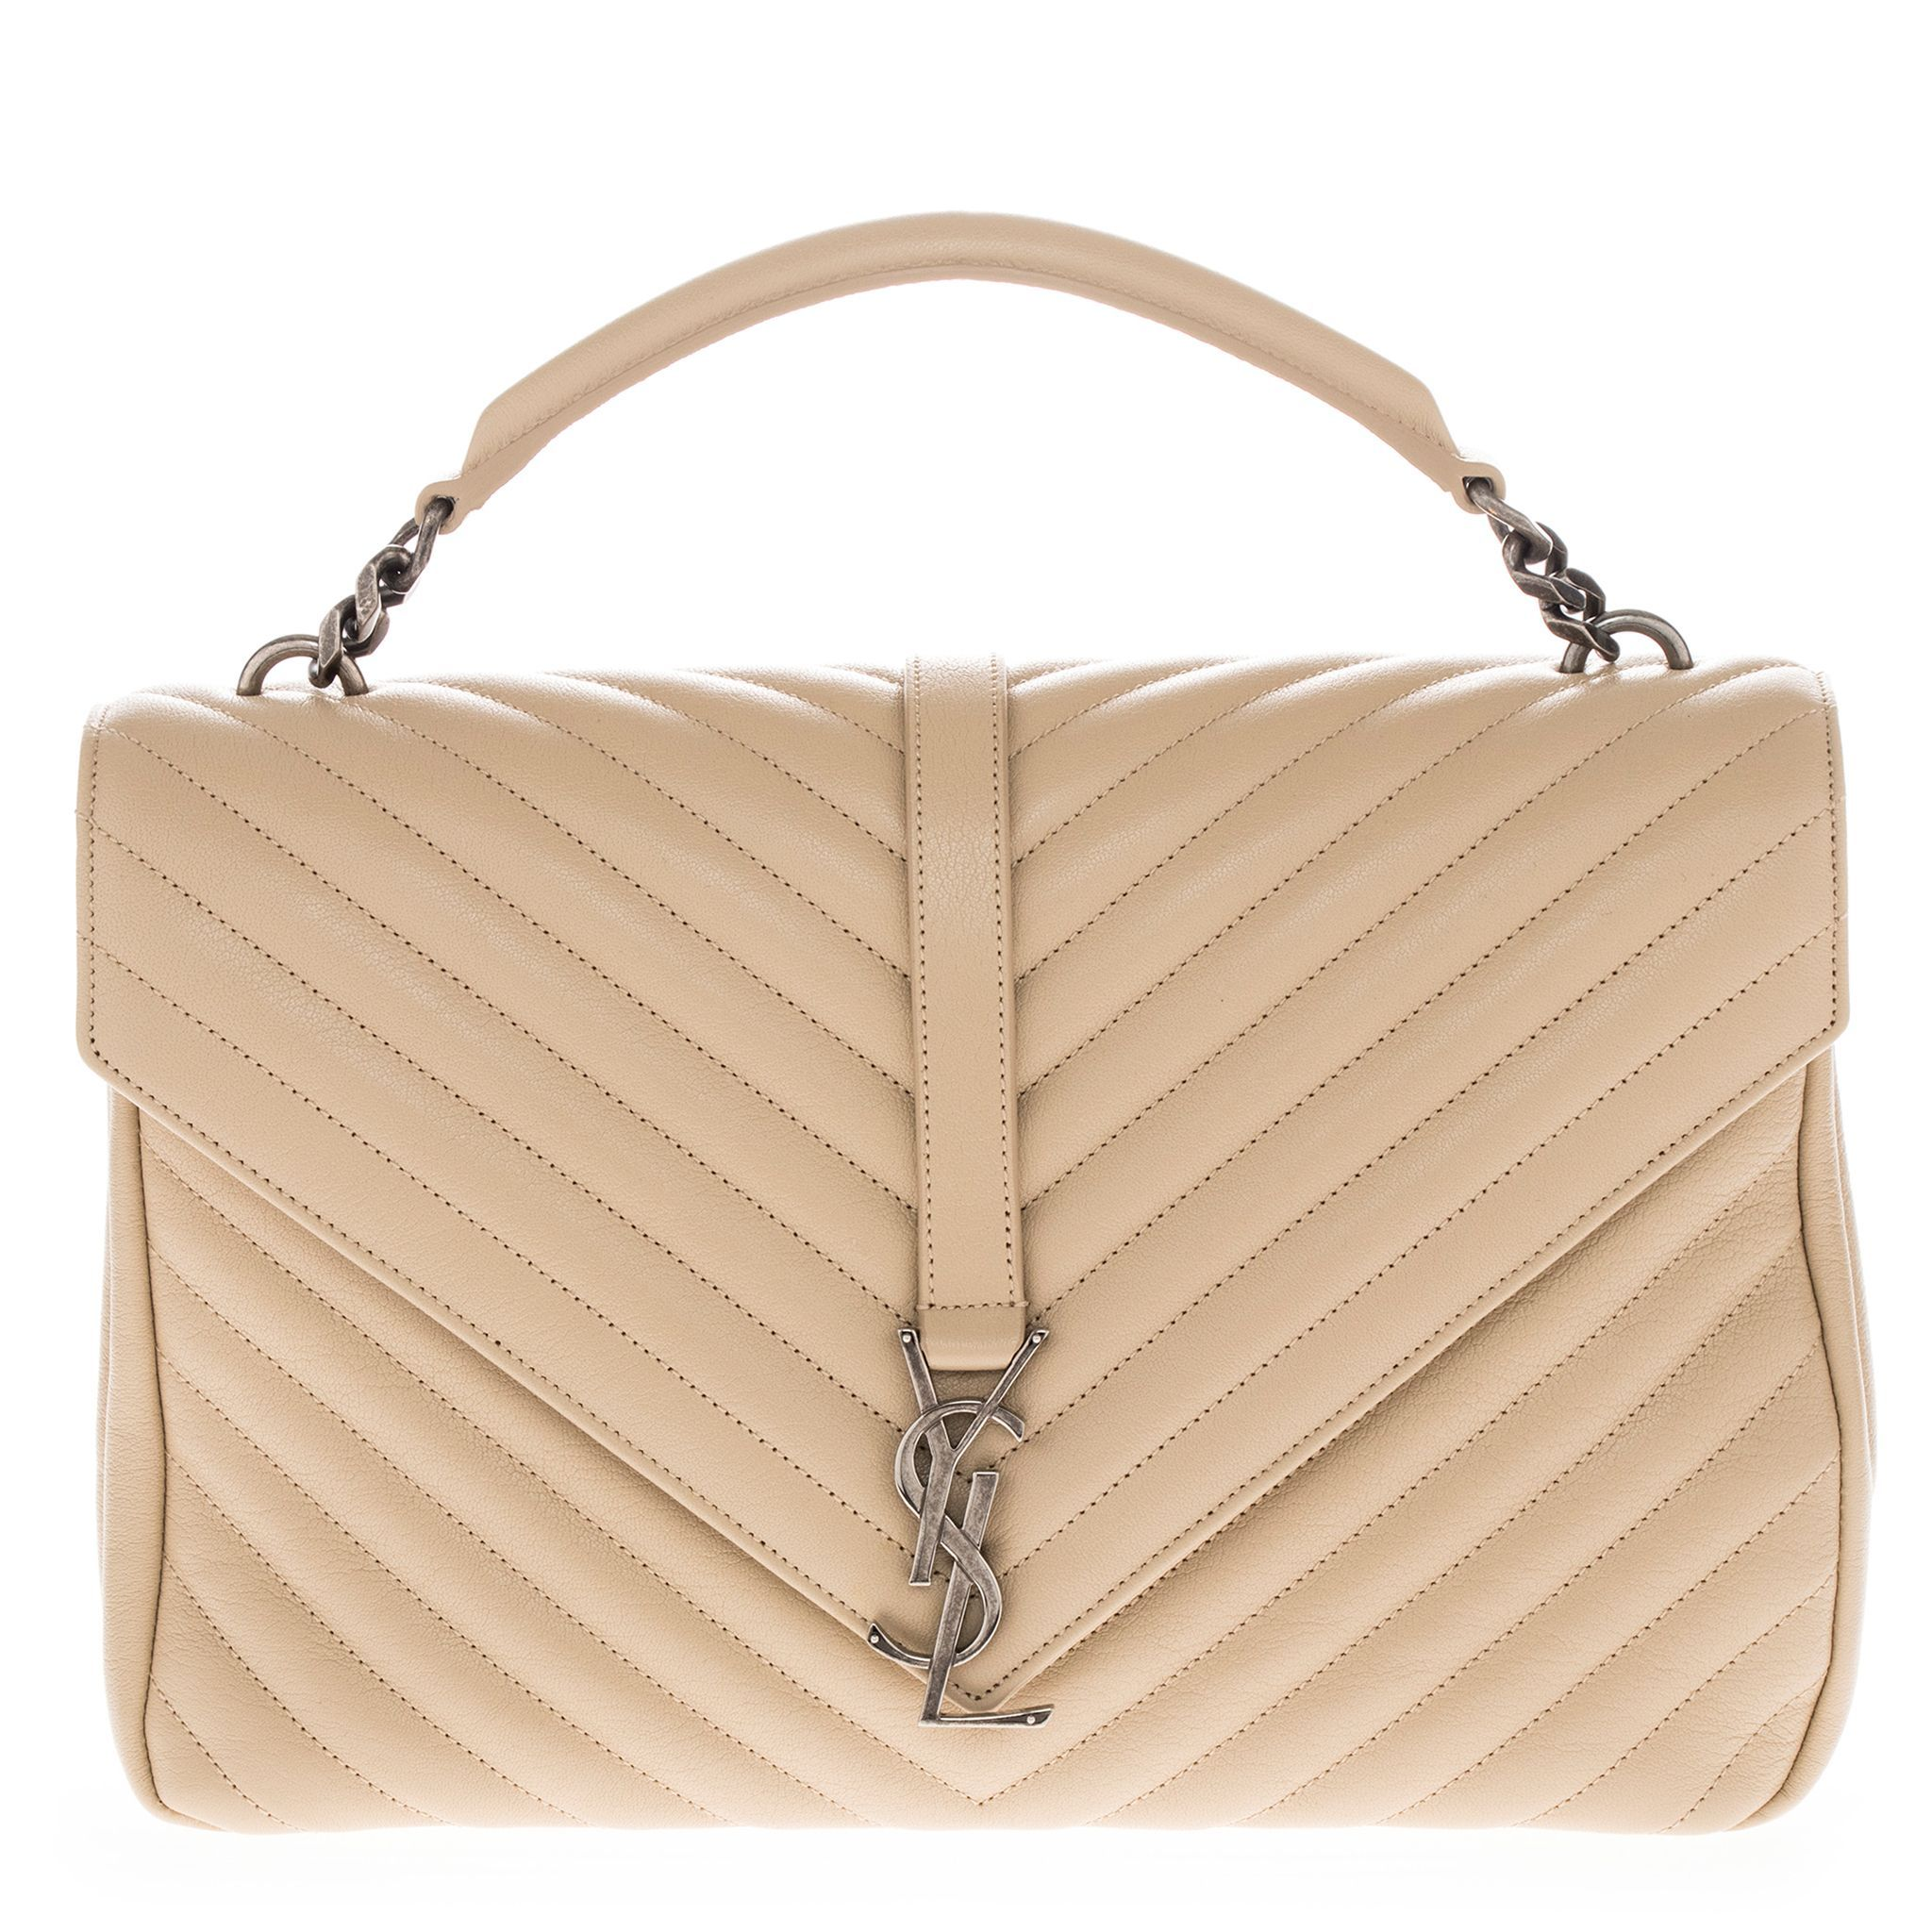 160d9373320 Saint Laurent College Monogram Matelasse Shoulder Handbag, Women's ...